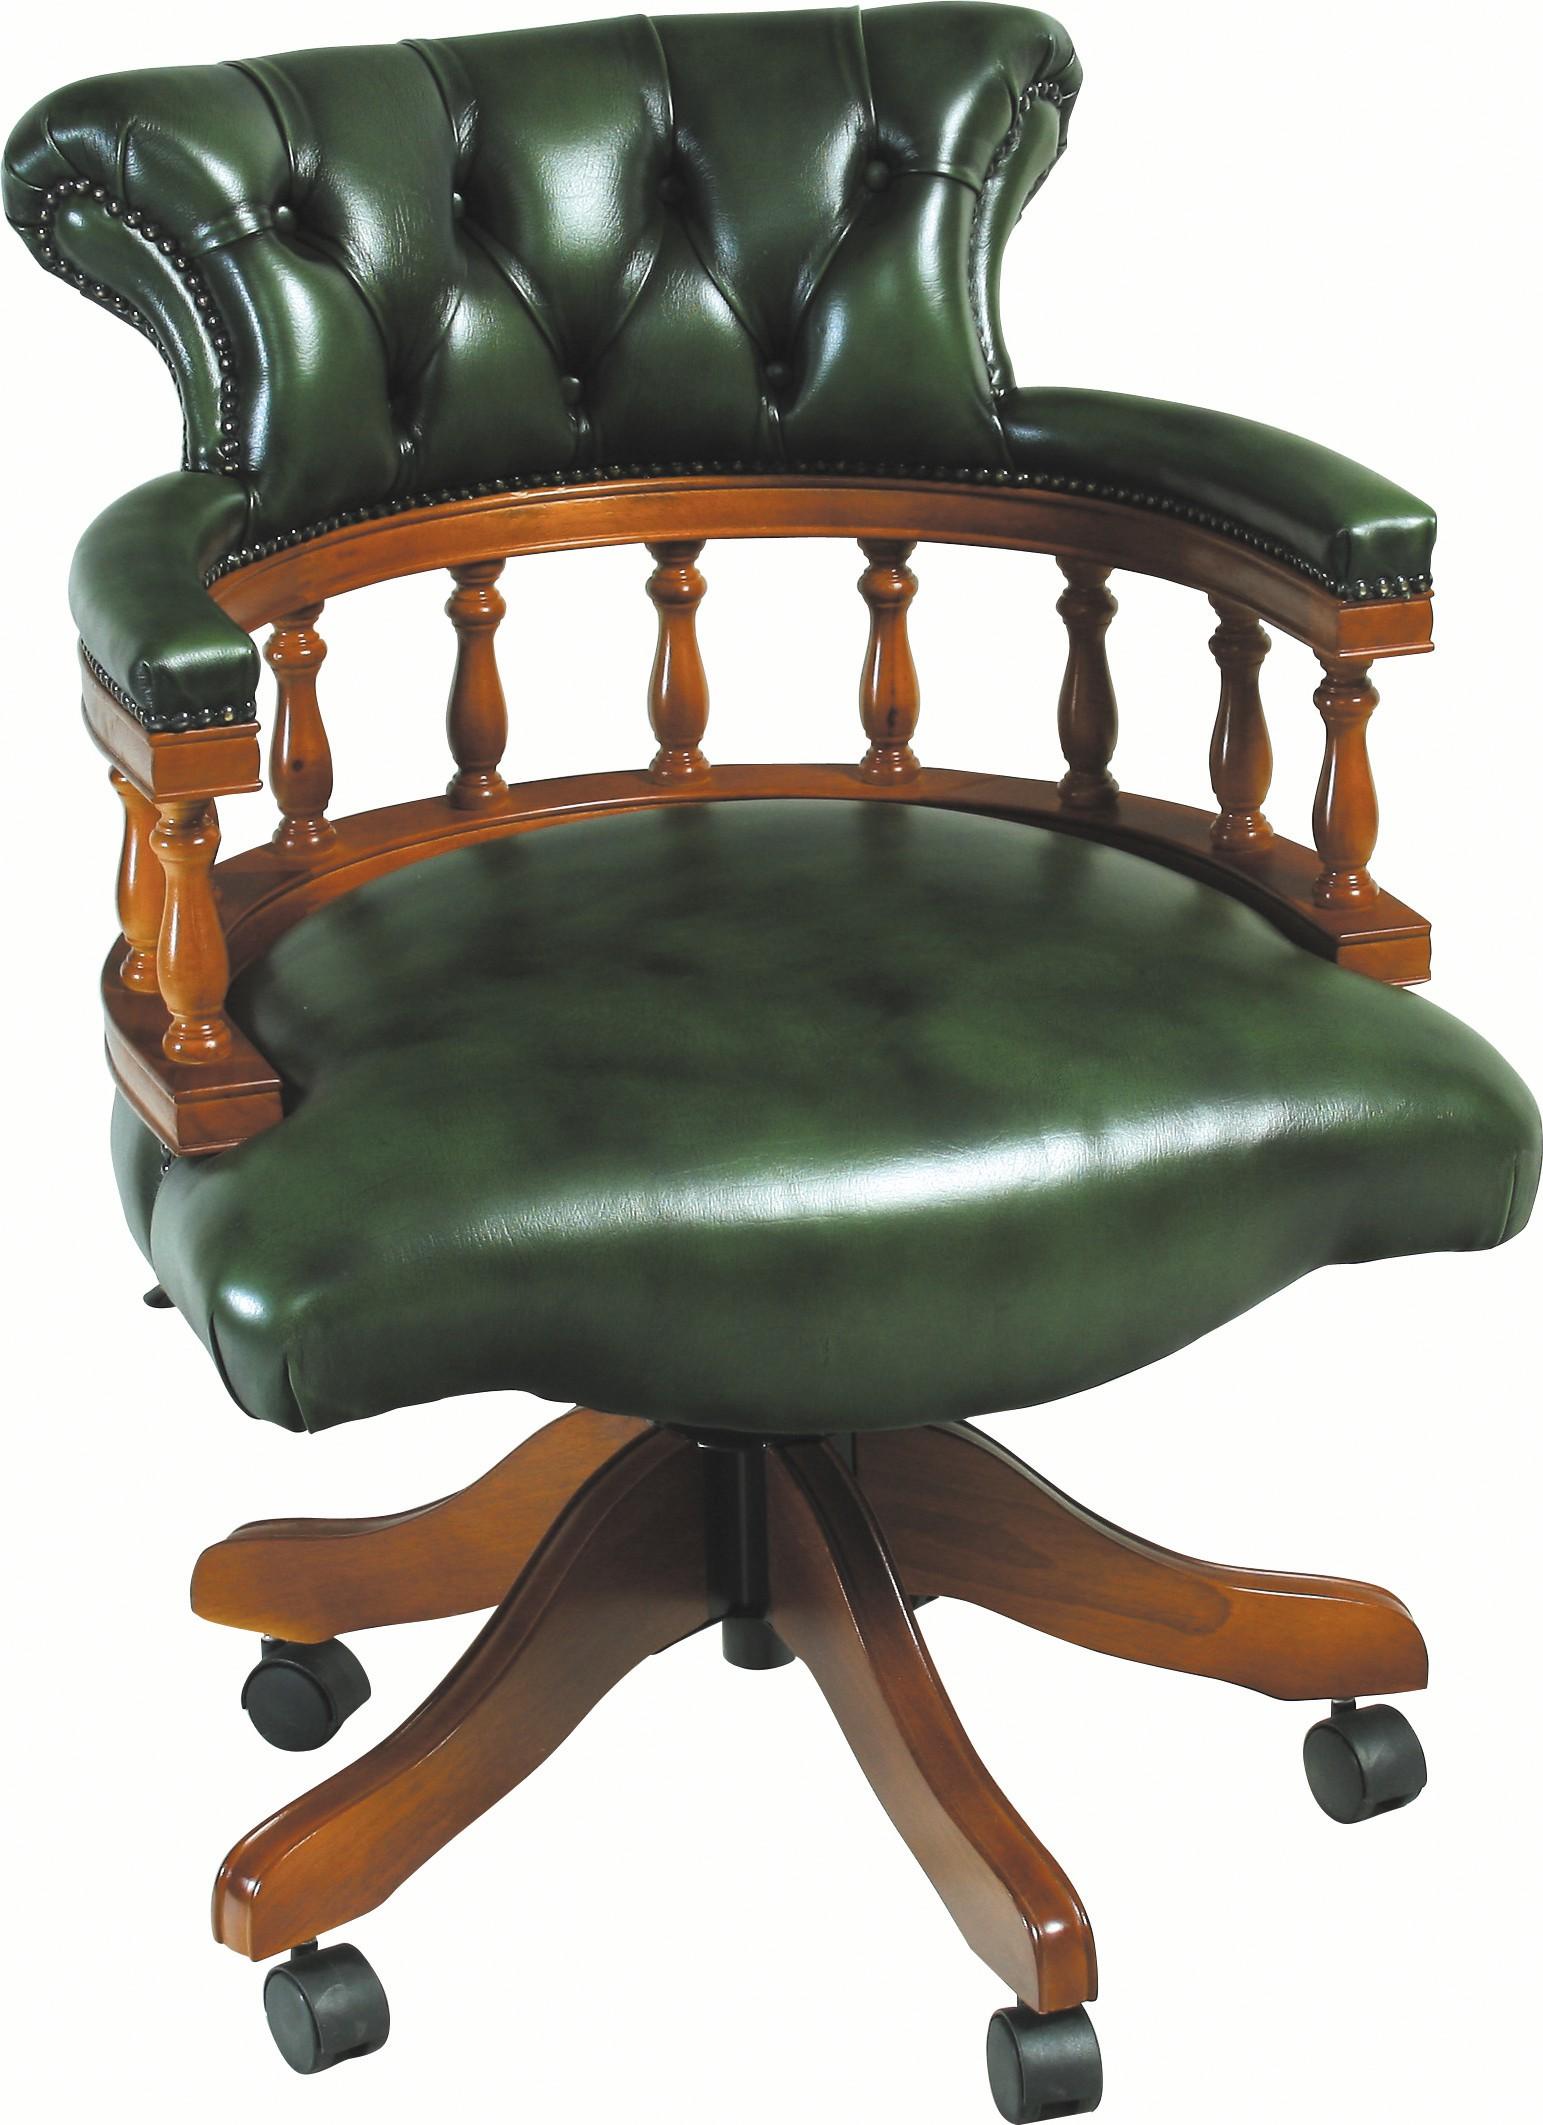 Captain's chair ZCOZJAL